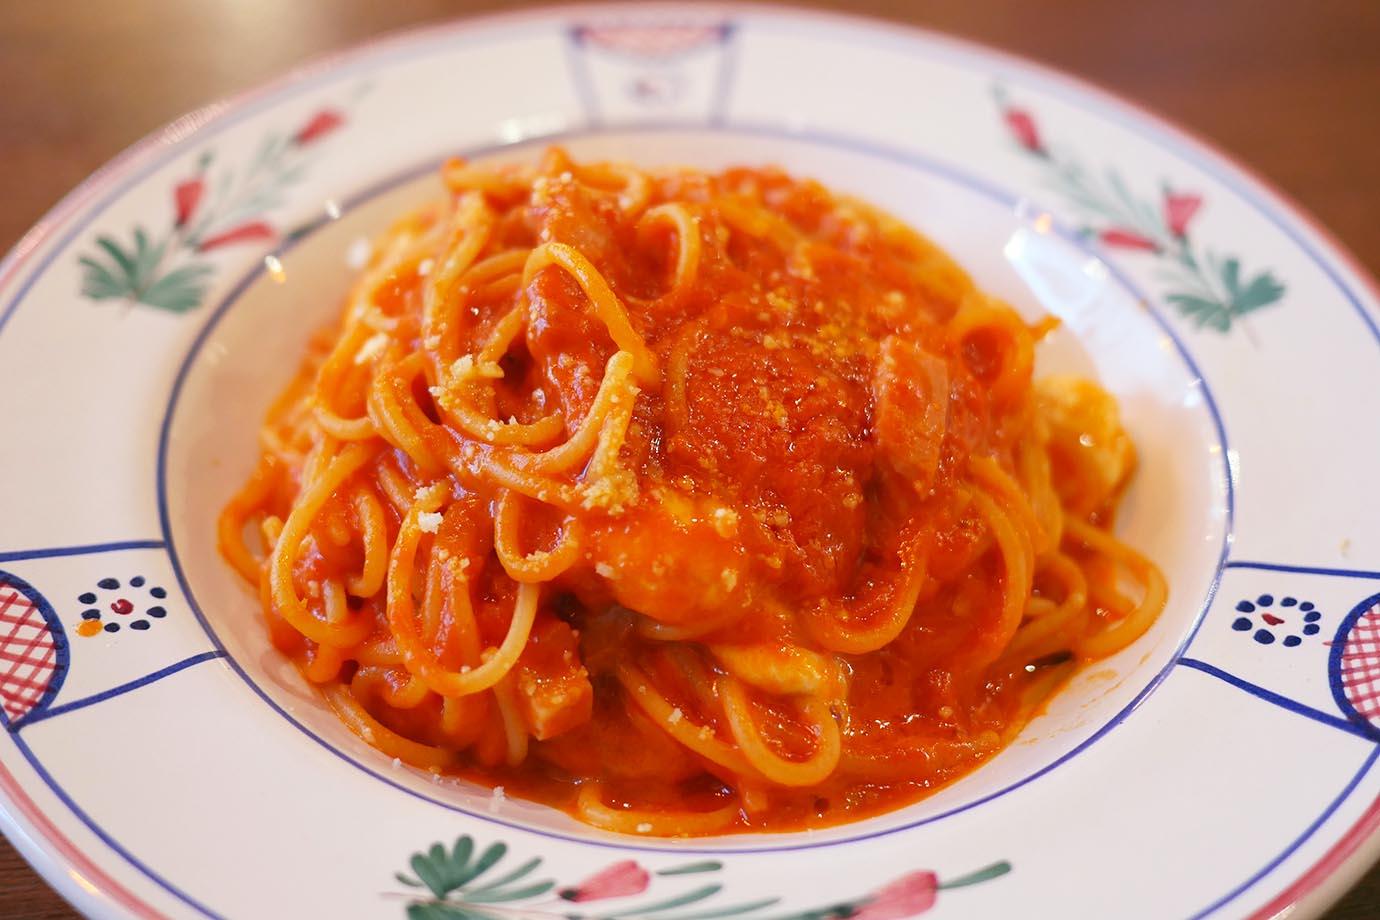 kumamoto-pizza-napoletana-il-forno-doro4